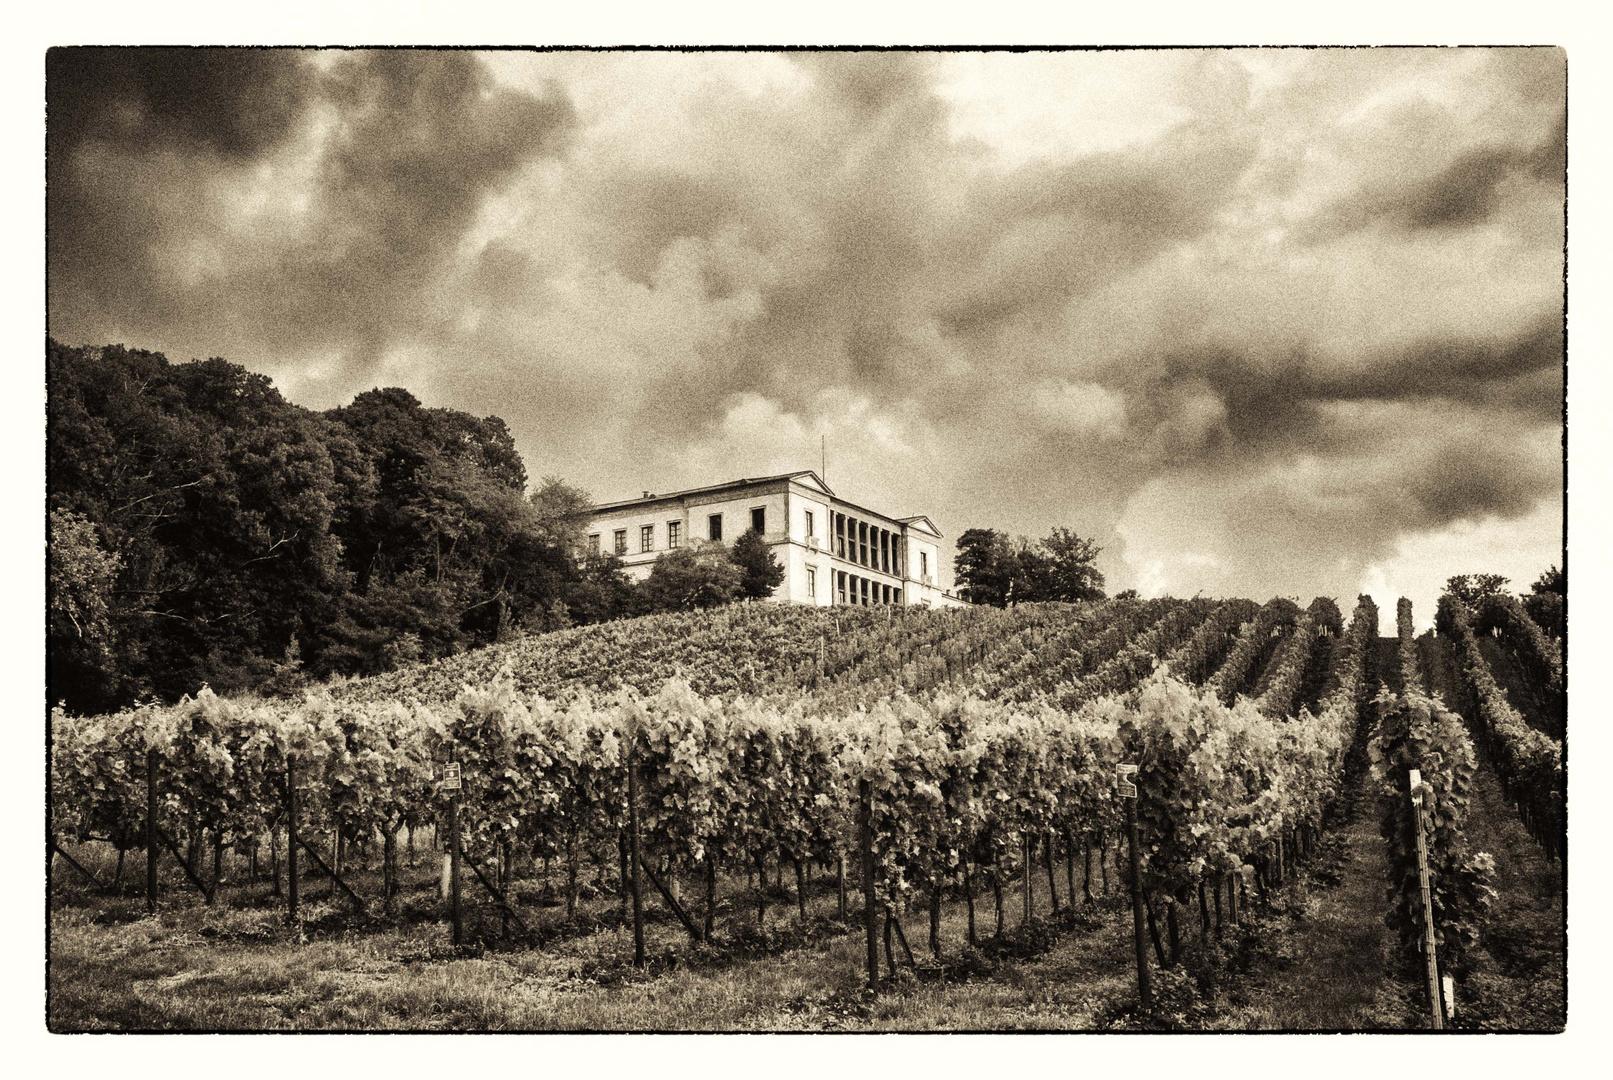 Sturm über der Villa Ludwigshöhe